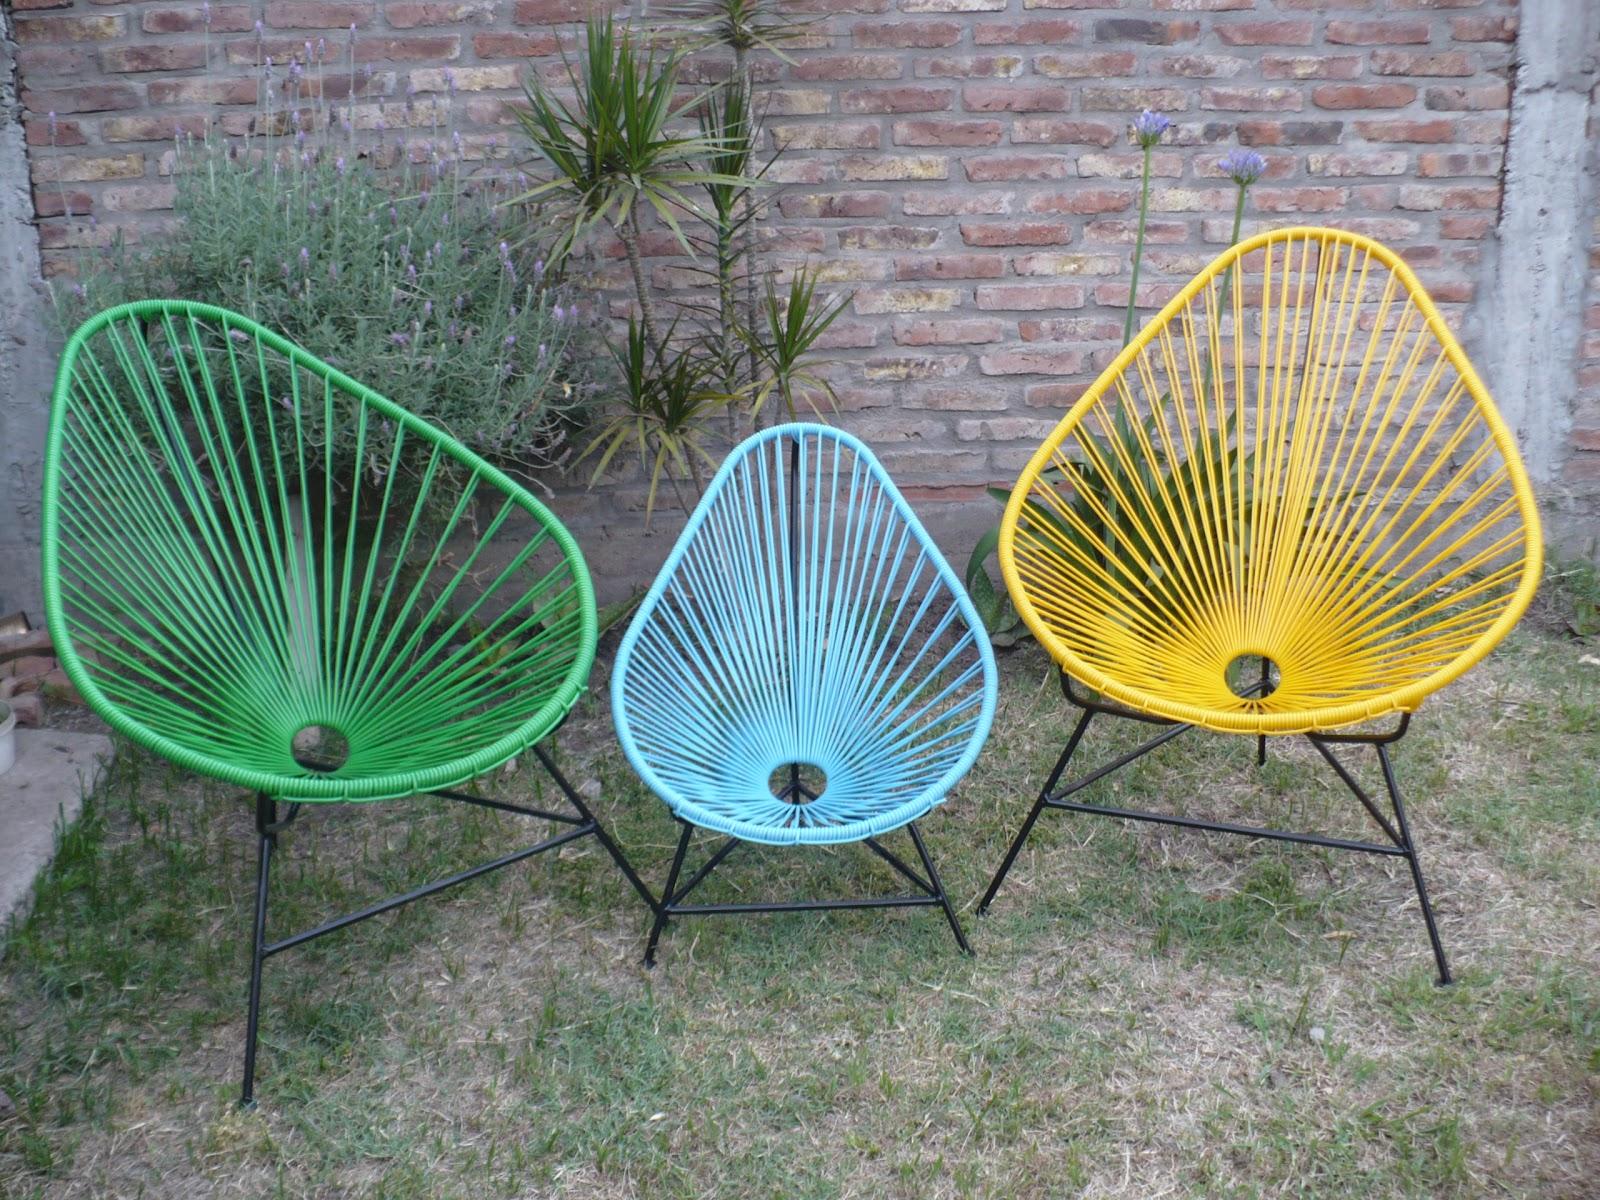 Fabrica Tm Muebles De Jardin # Muebles Quilmes